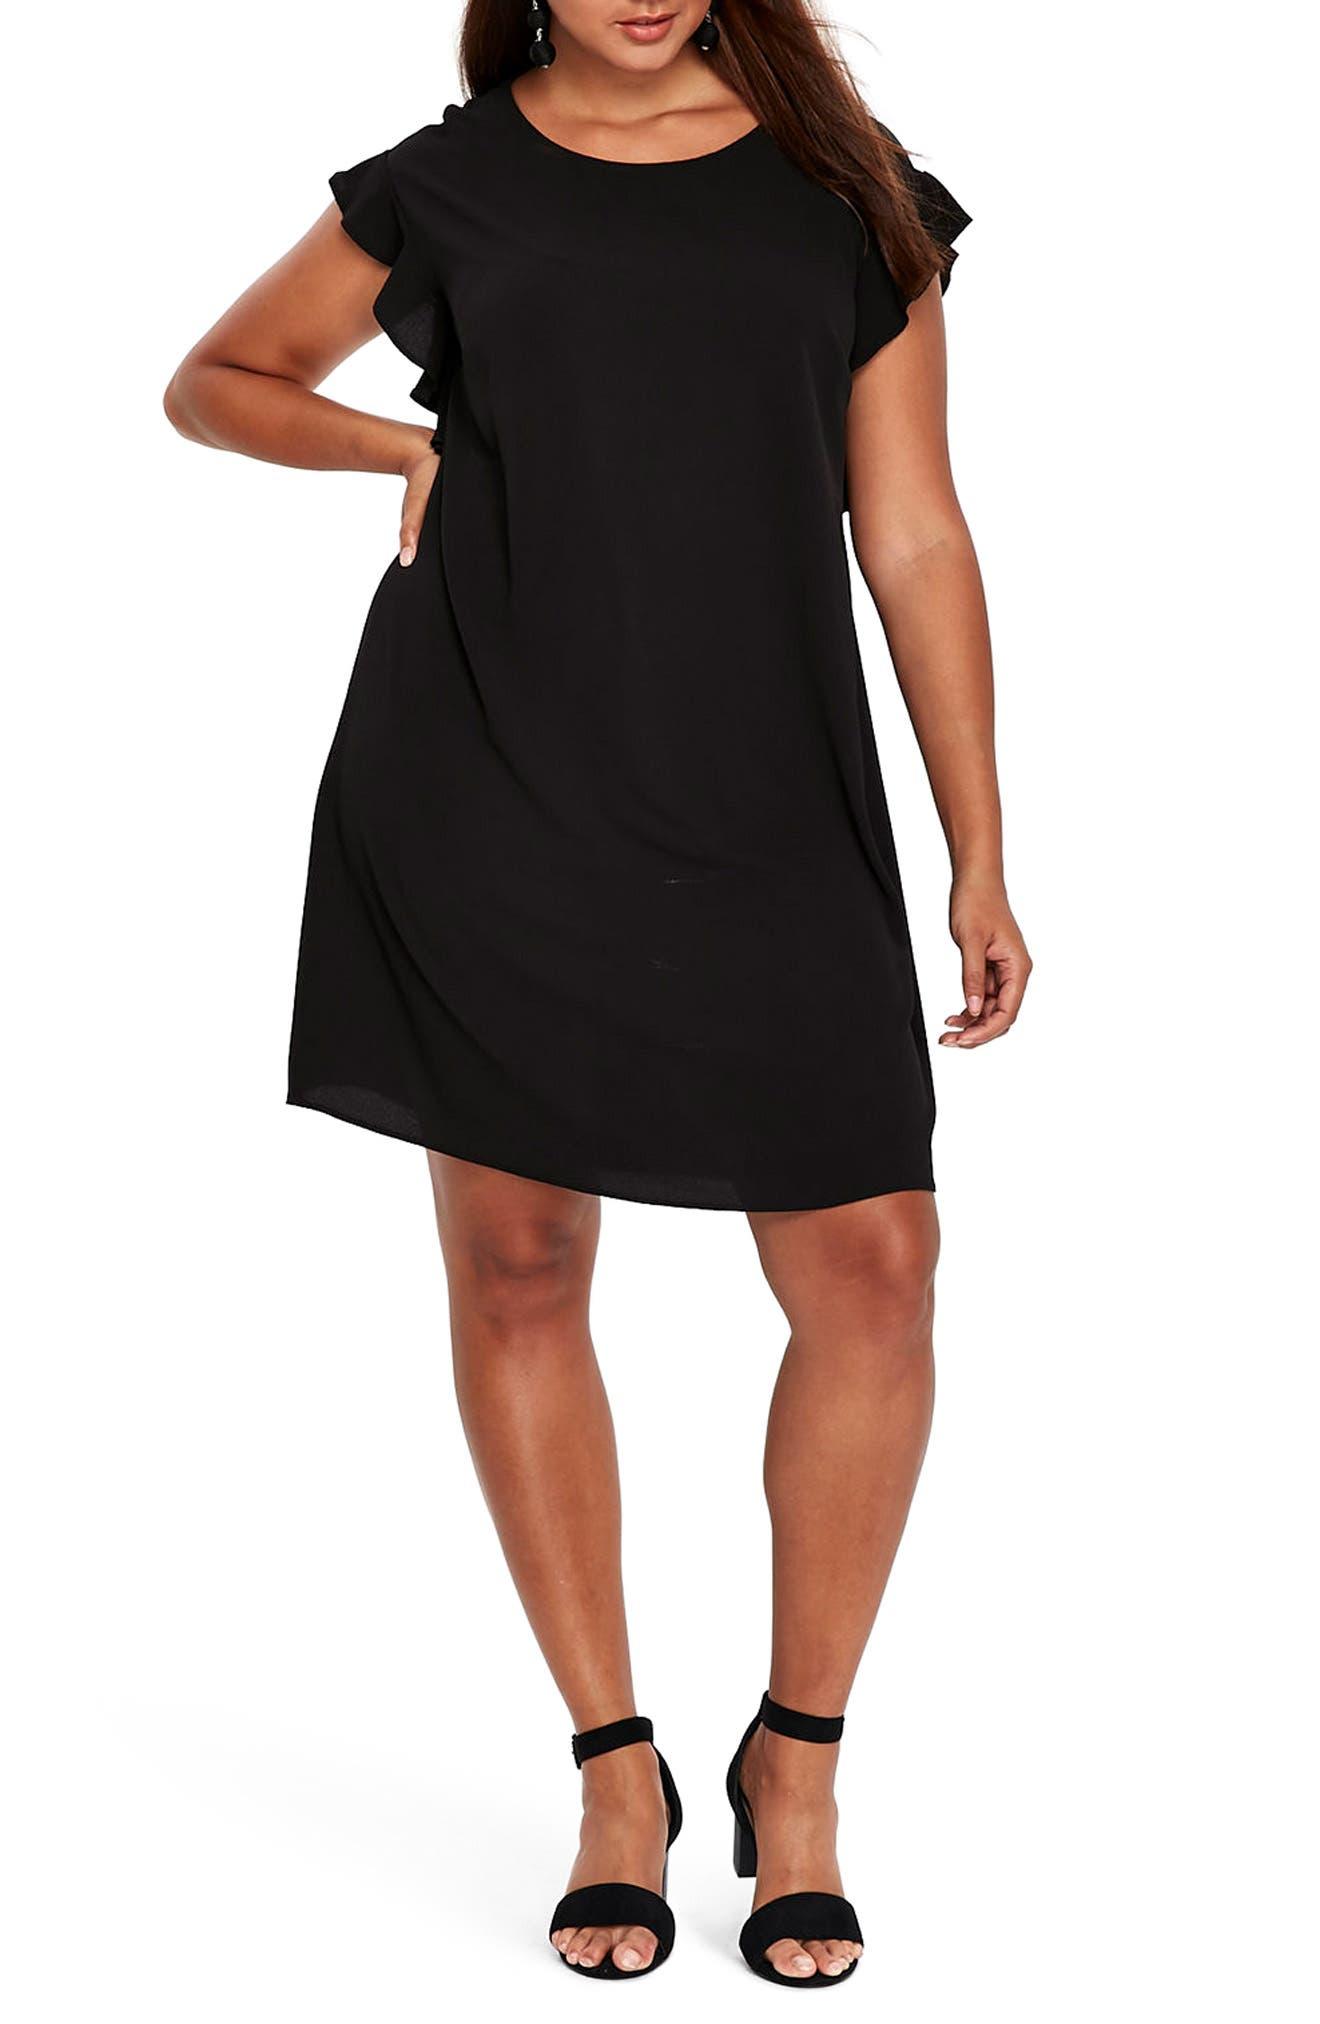 Alternate Image 1 Selected - Evans Ruffle Sleeve Shift Dress (Plus Size)